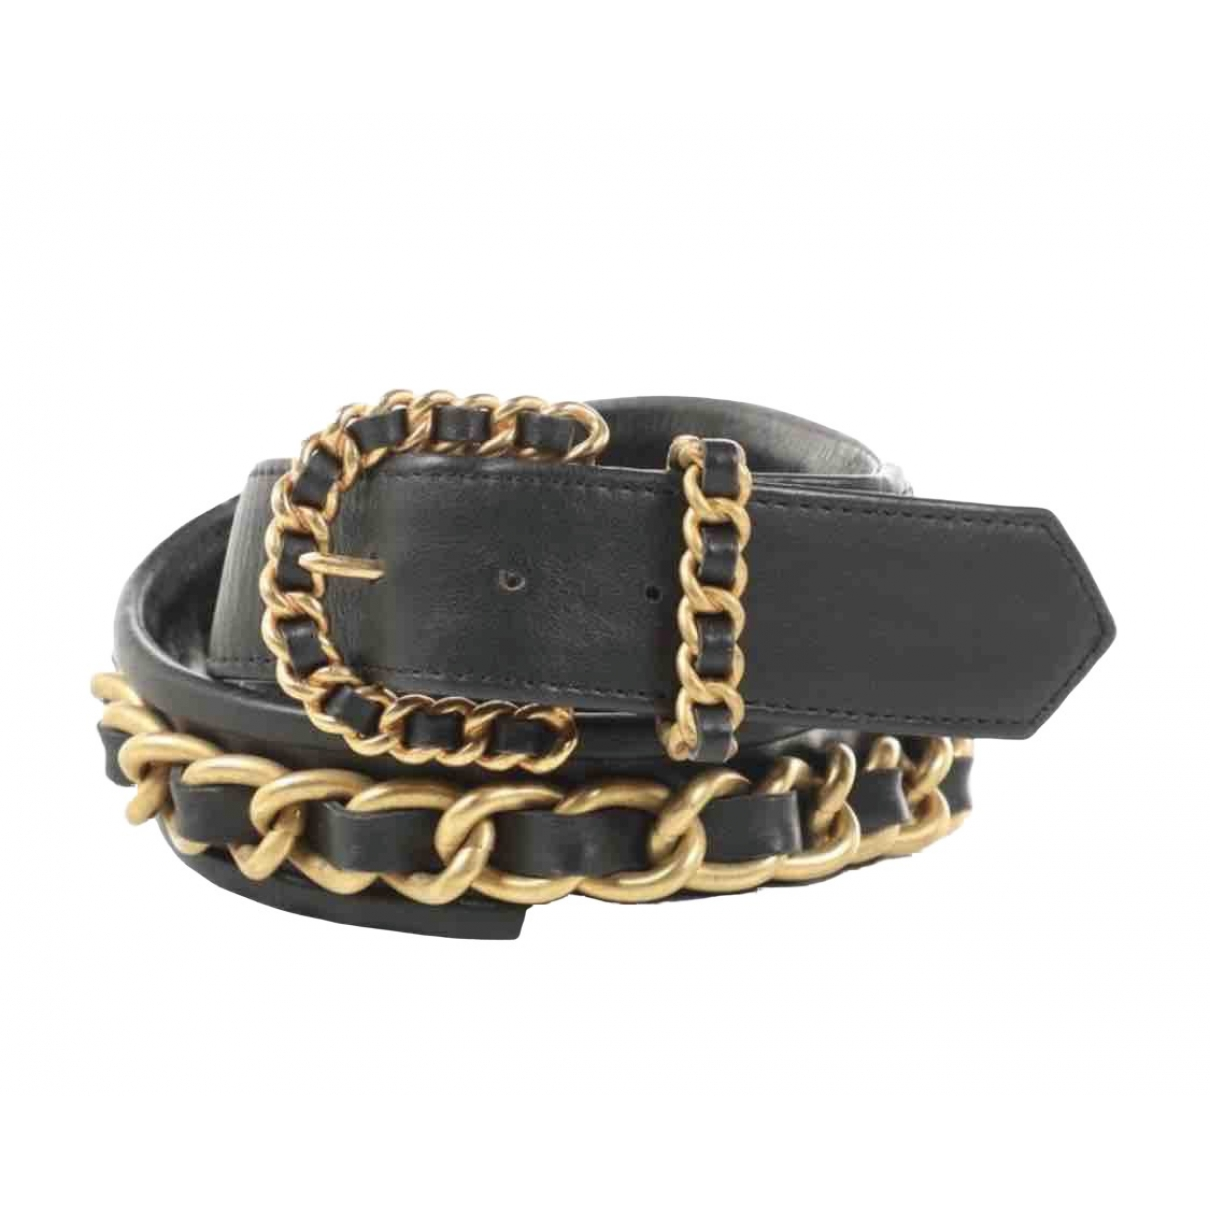 Chanel \N Black Leather belt for Women 75 cm